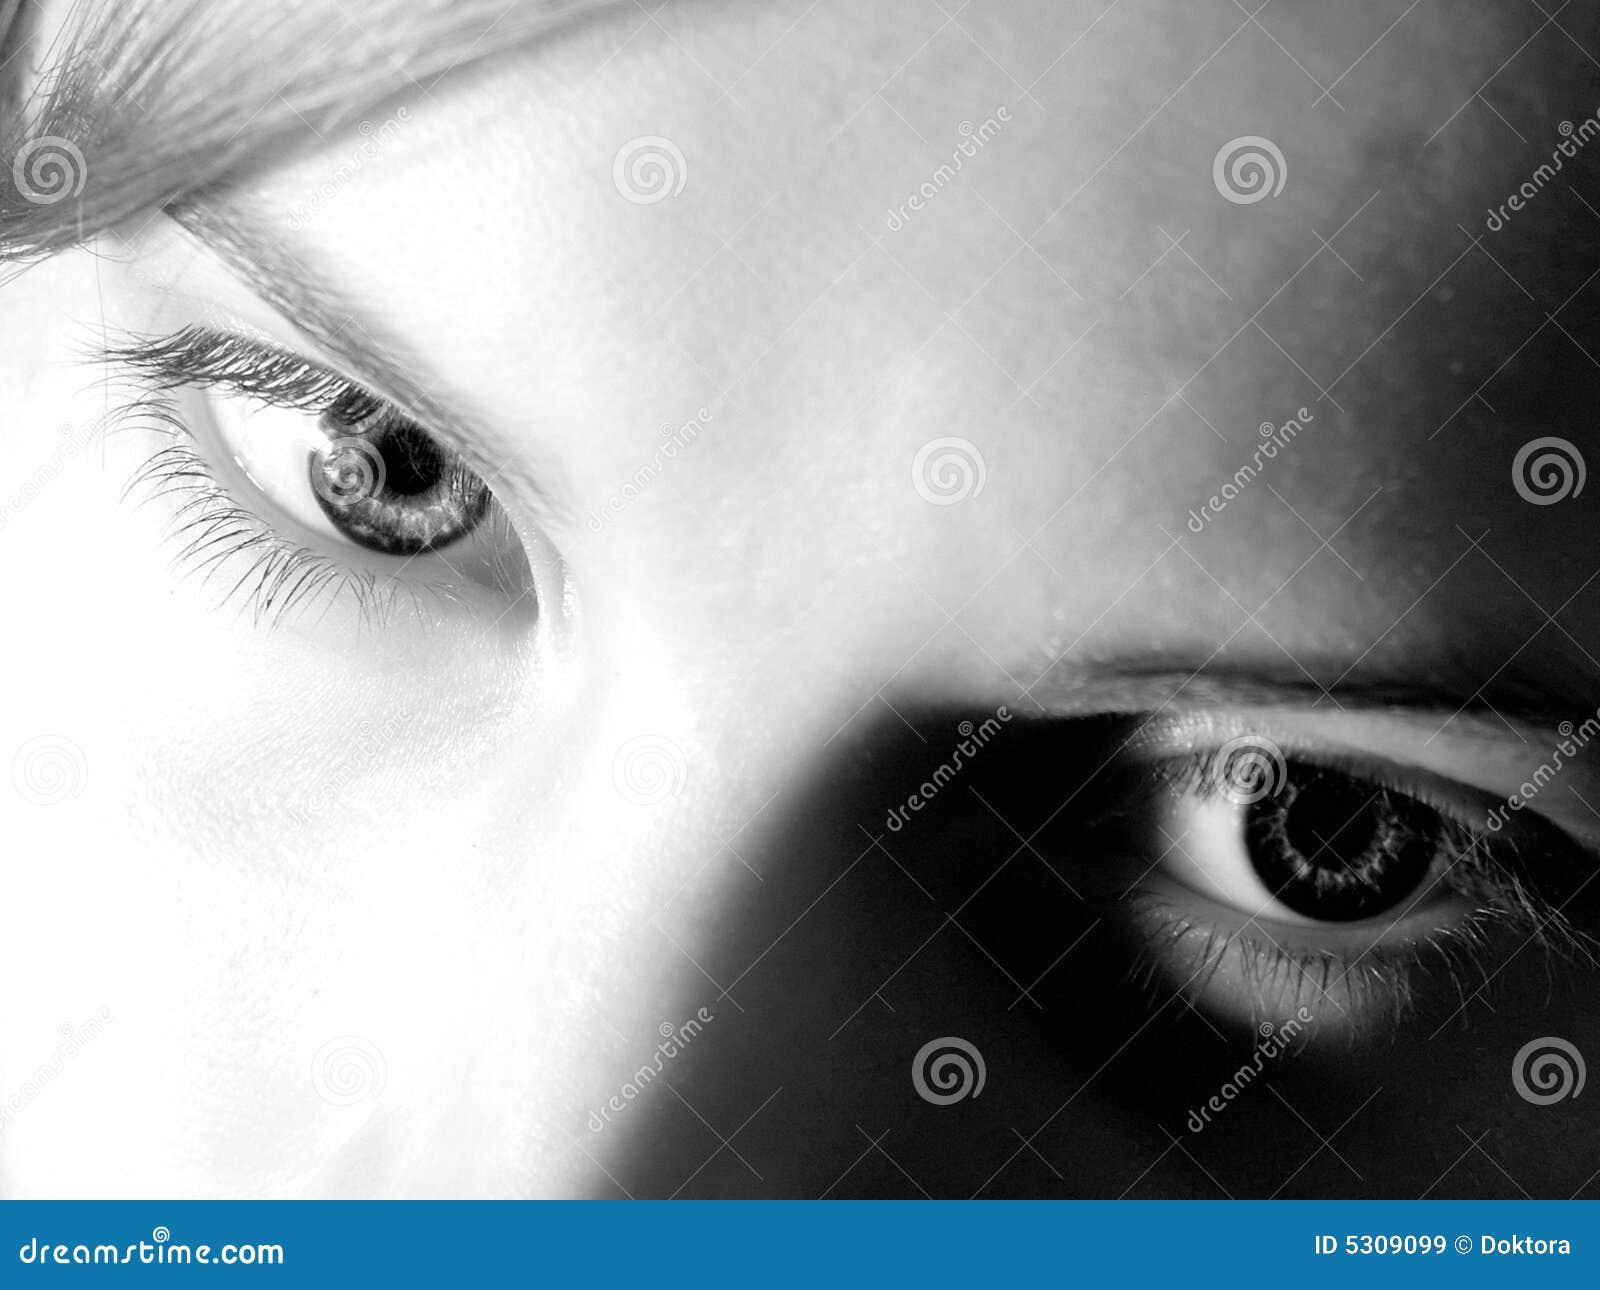 Download La femmina eyes #01 immagine stock. Immagine di youthful - 5309099